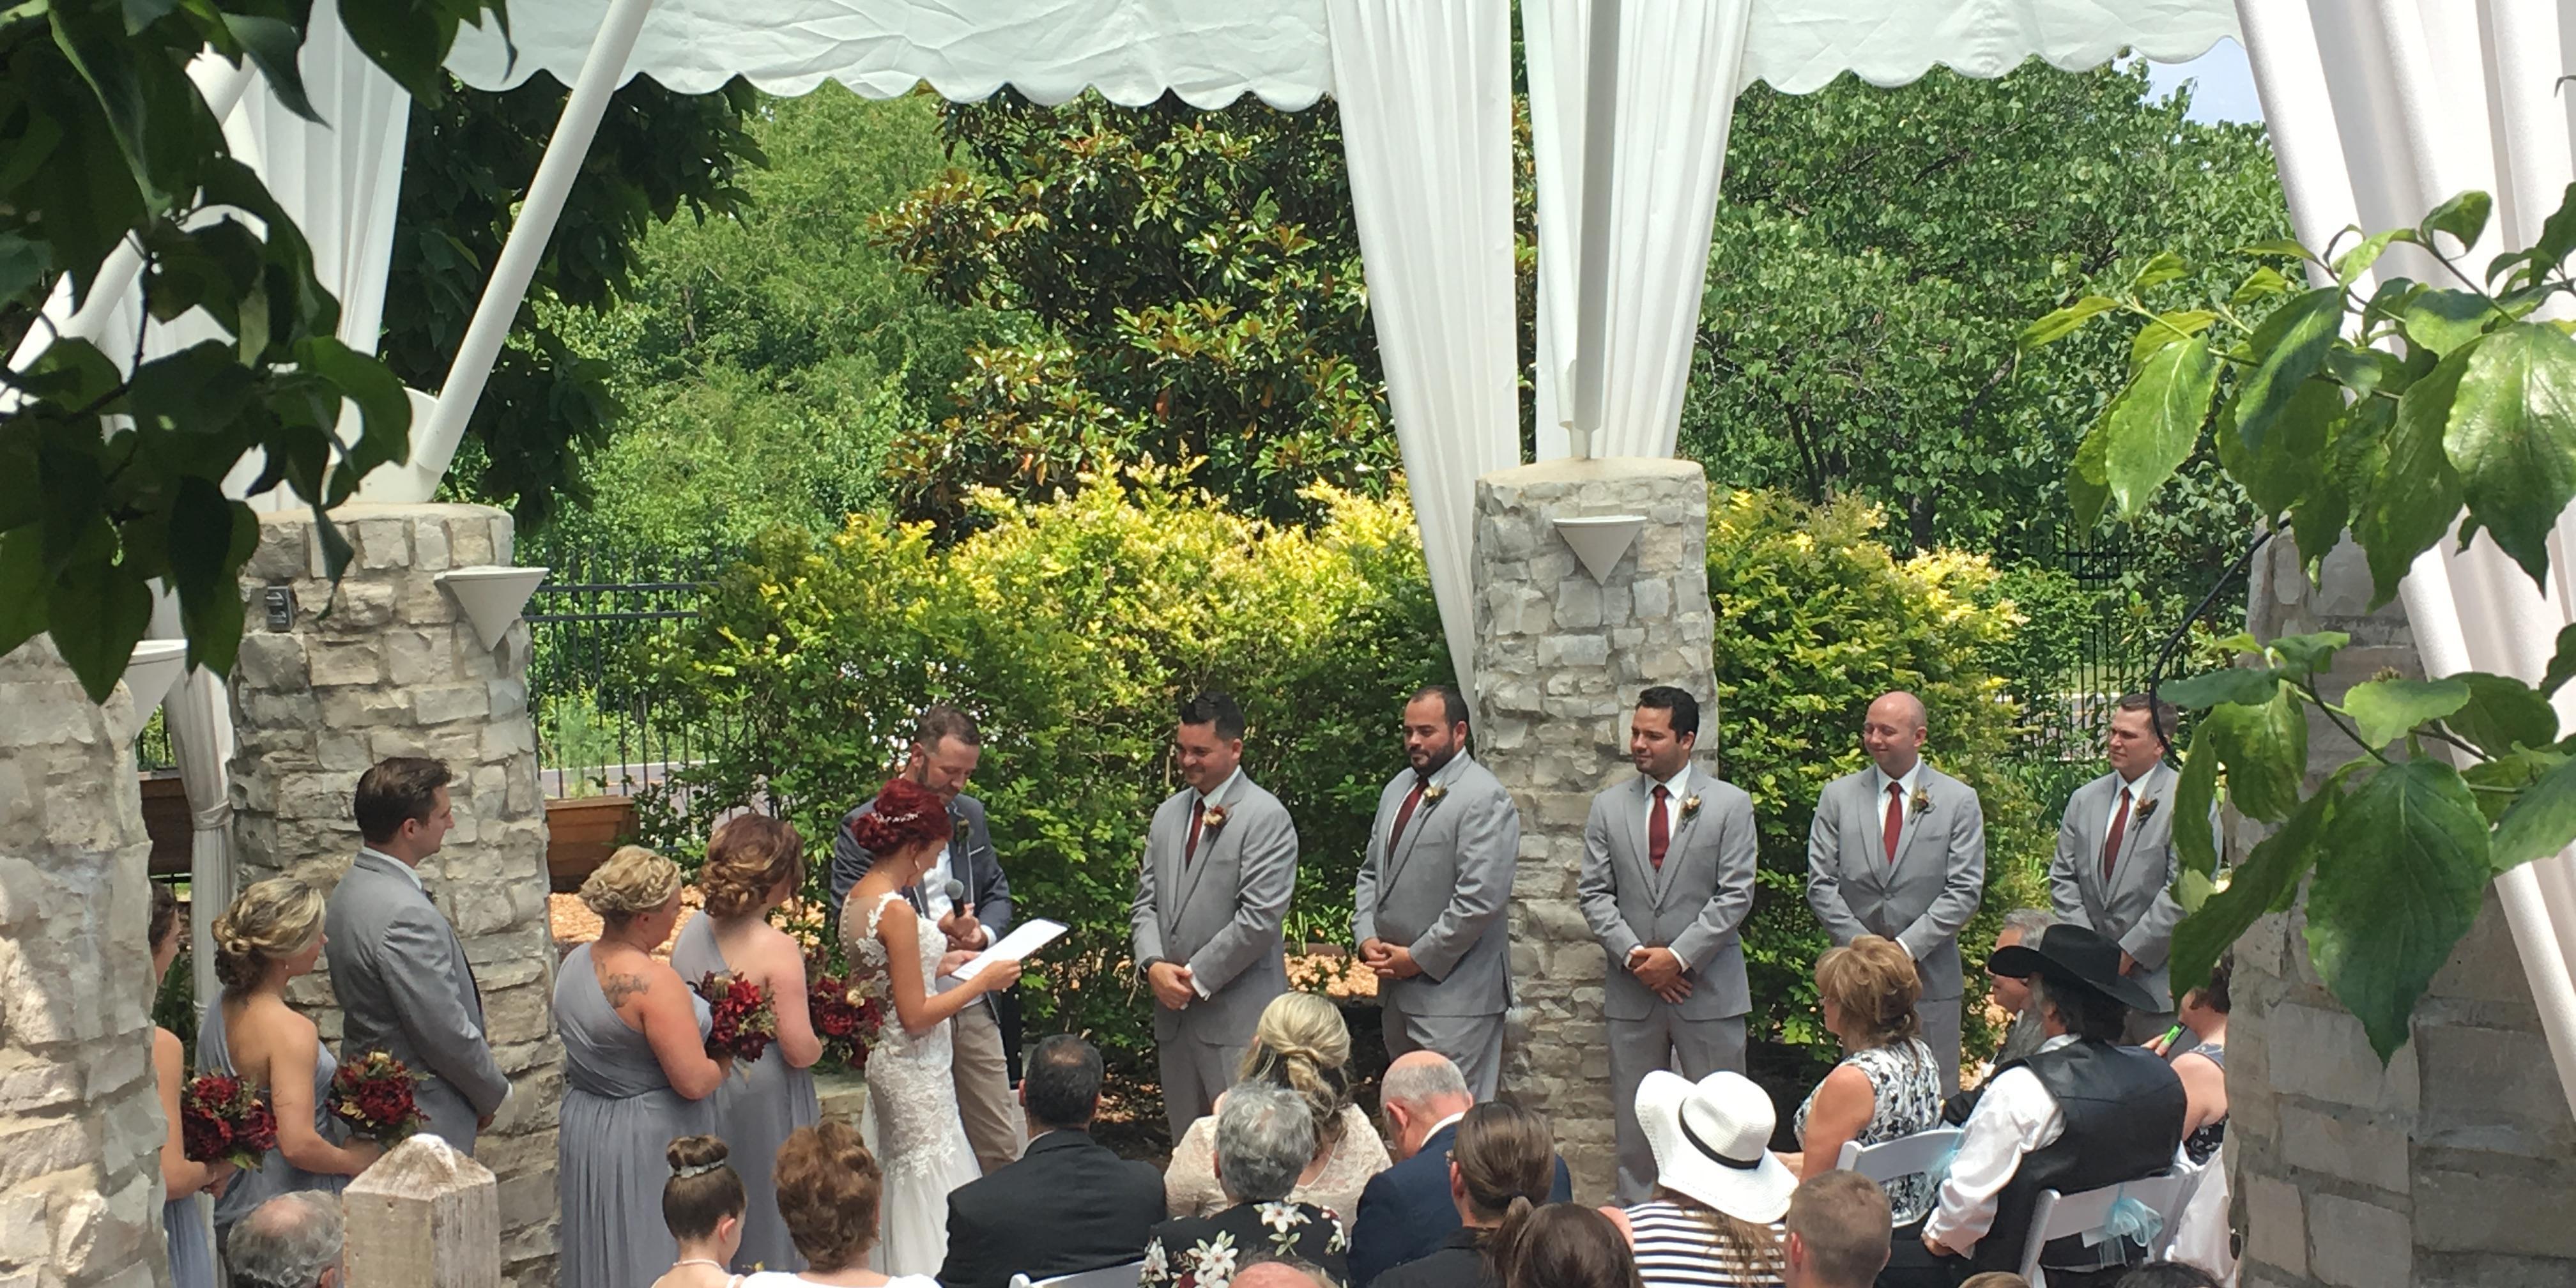 Sophia M Sachs Butterfly House wedding St. Louis